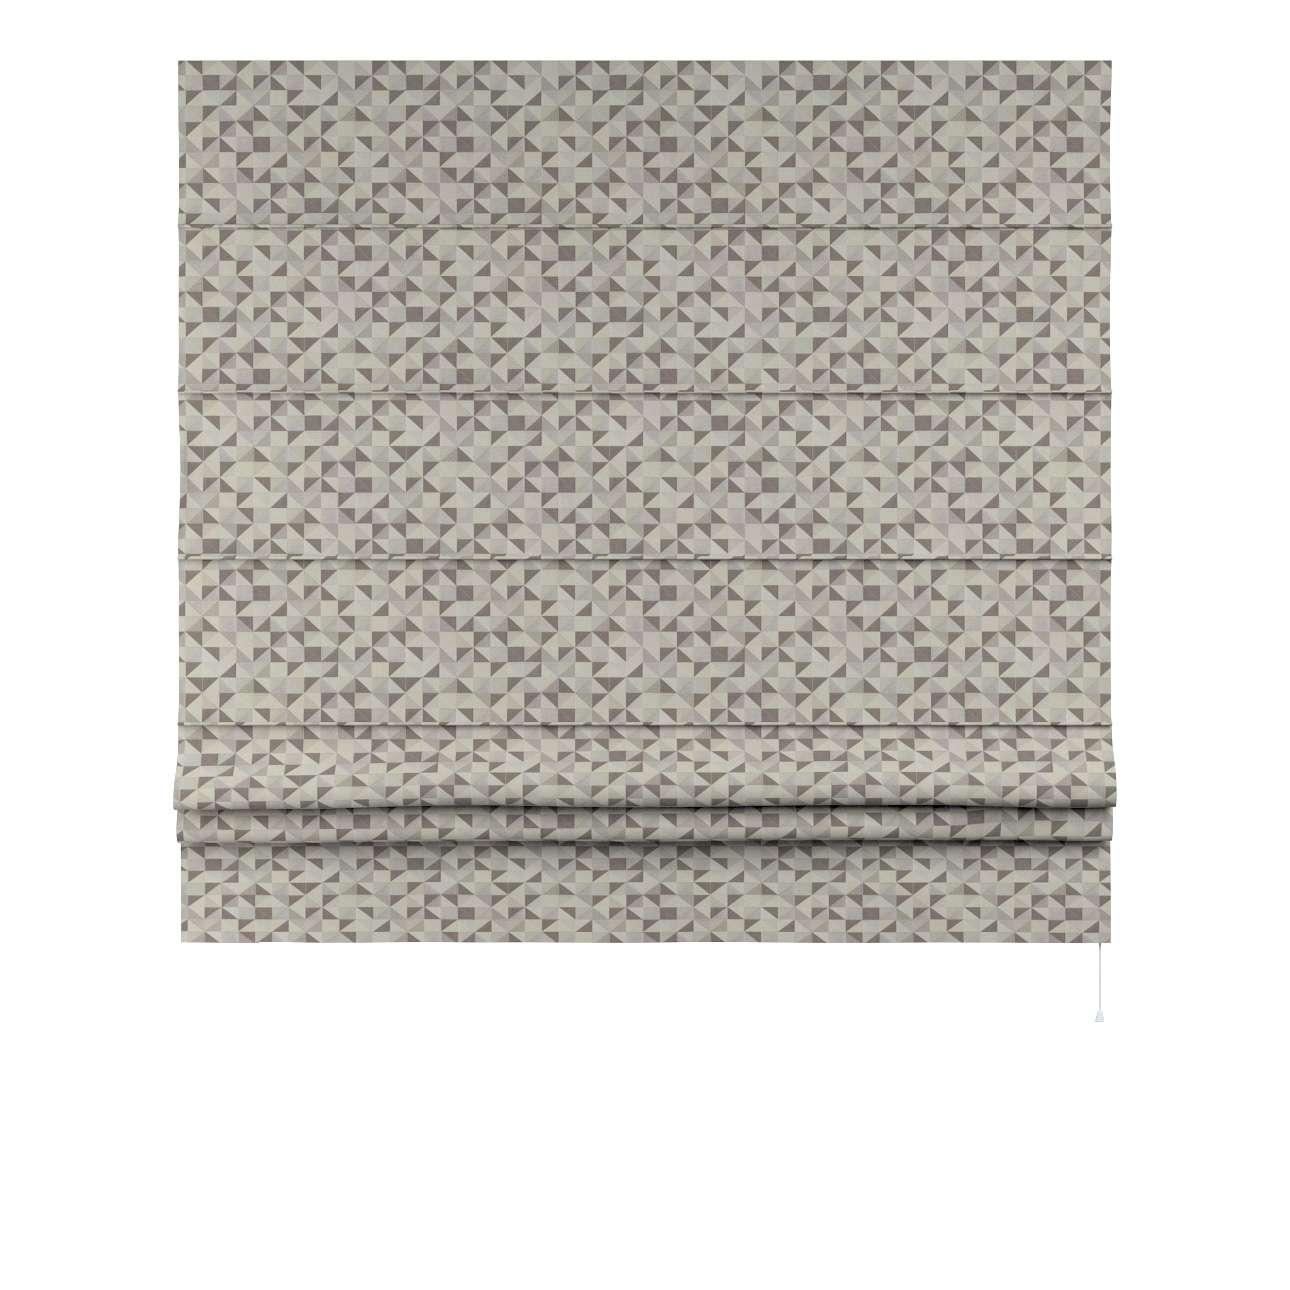 Rímska roleta Padva V kolekcii Retro Glam, tkanina: 142-85